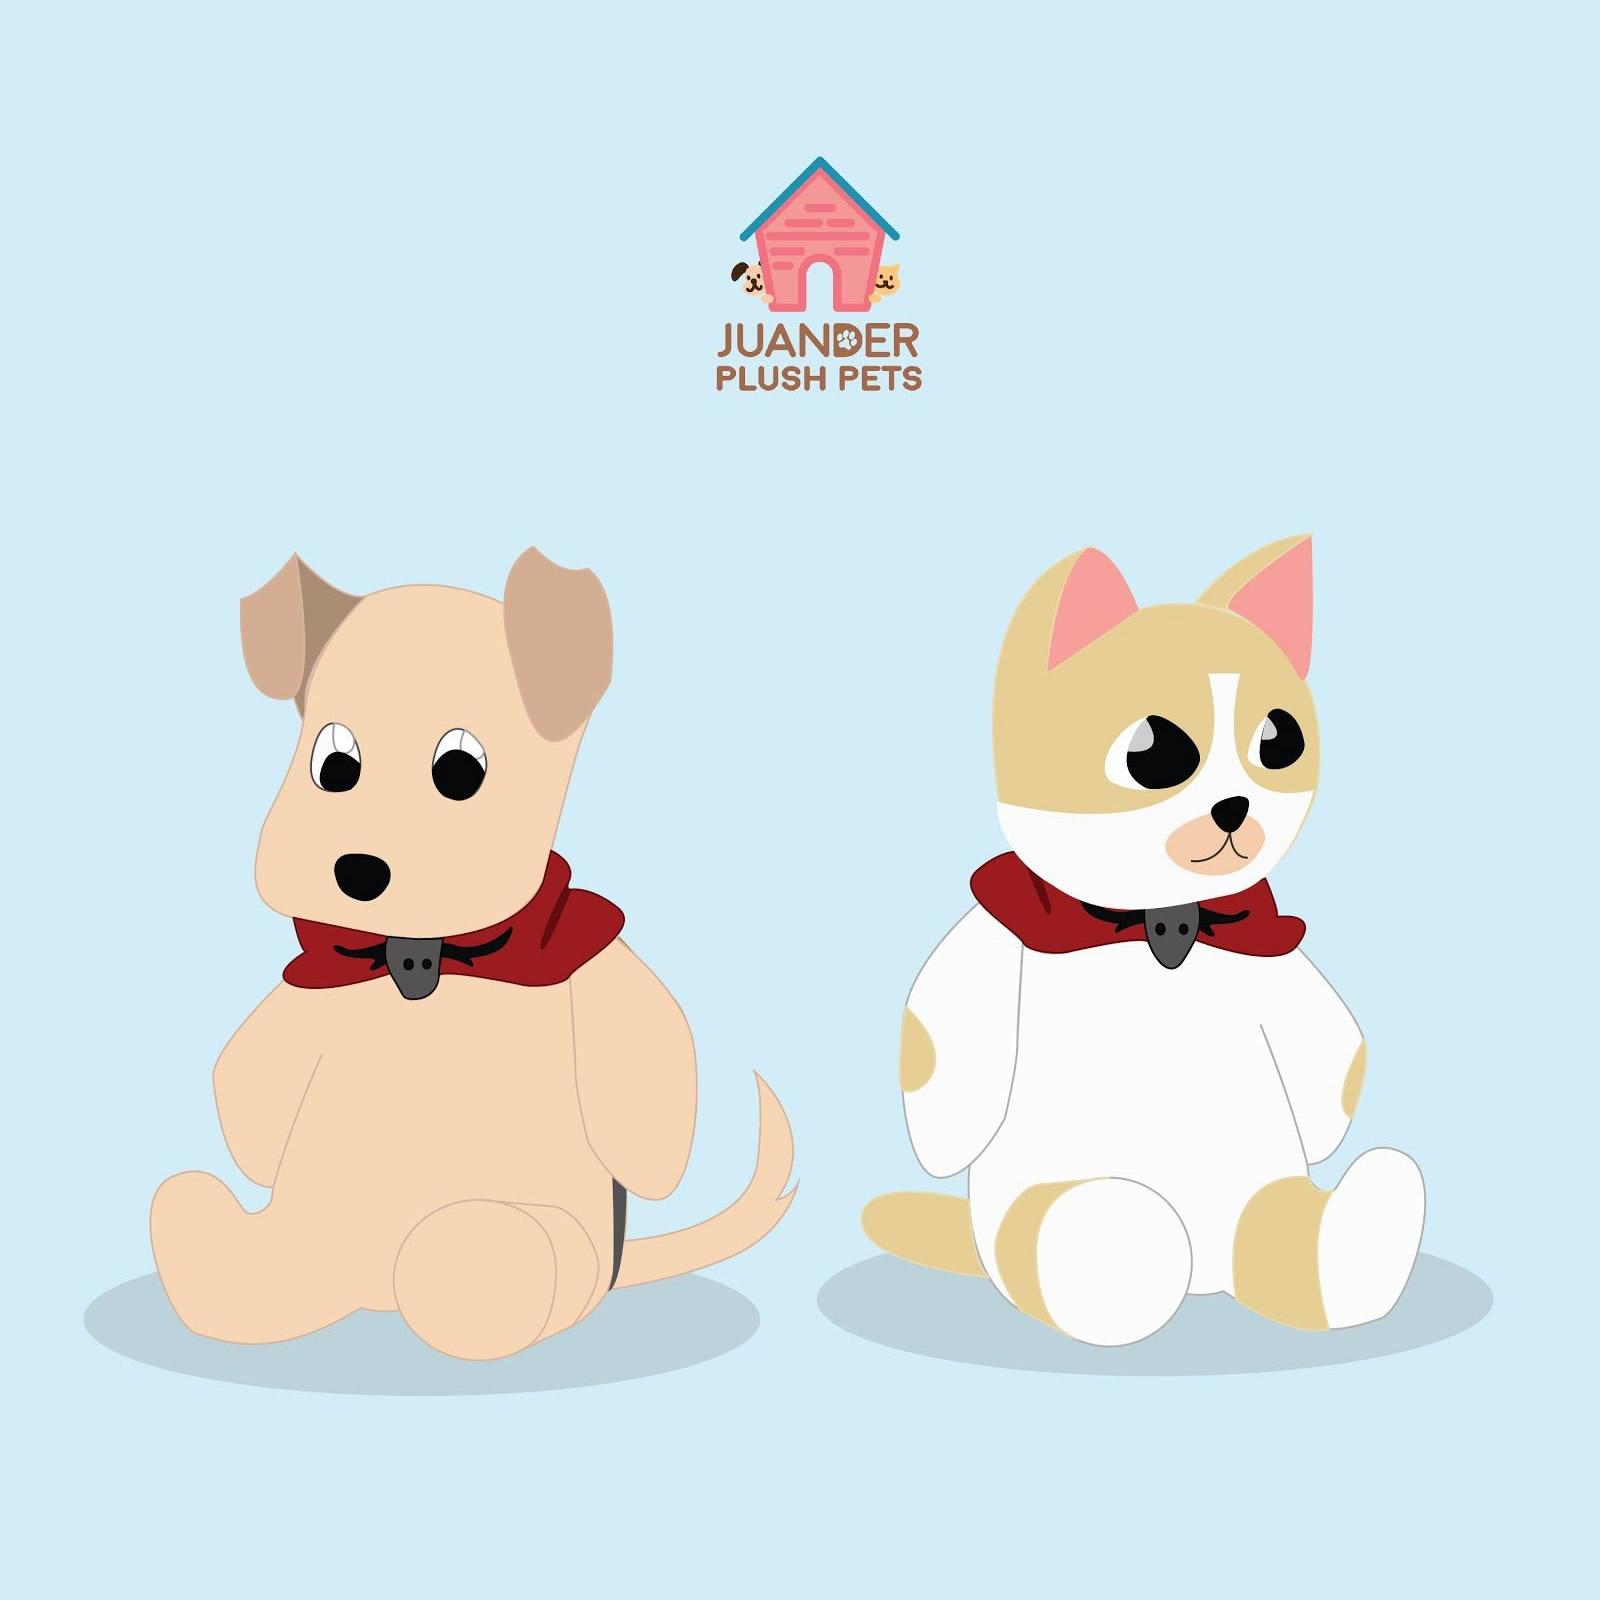 Juander Plush Pets B